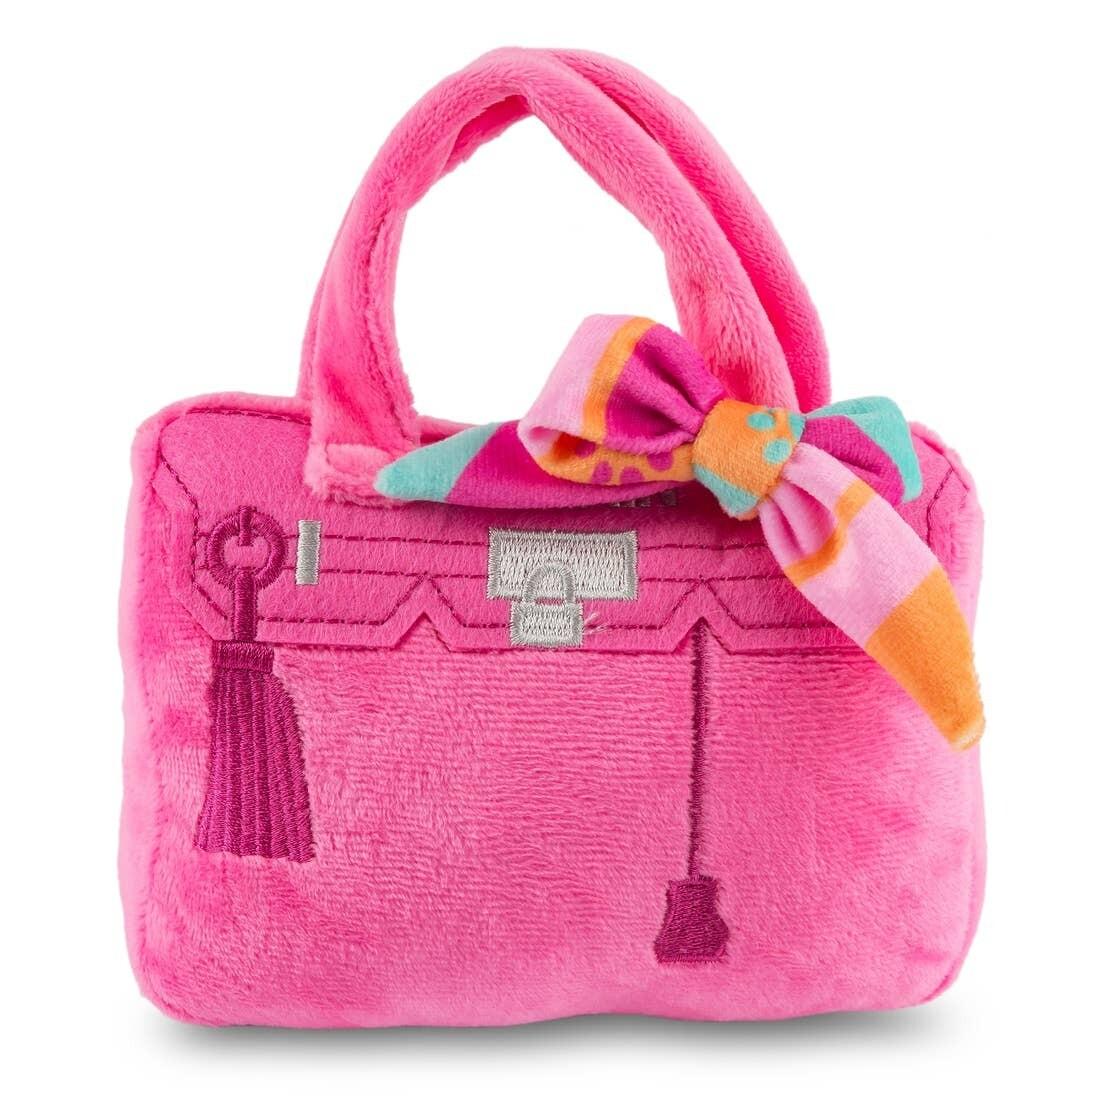 Barkin Bag with Scarf